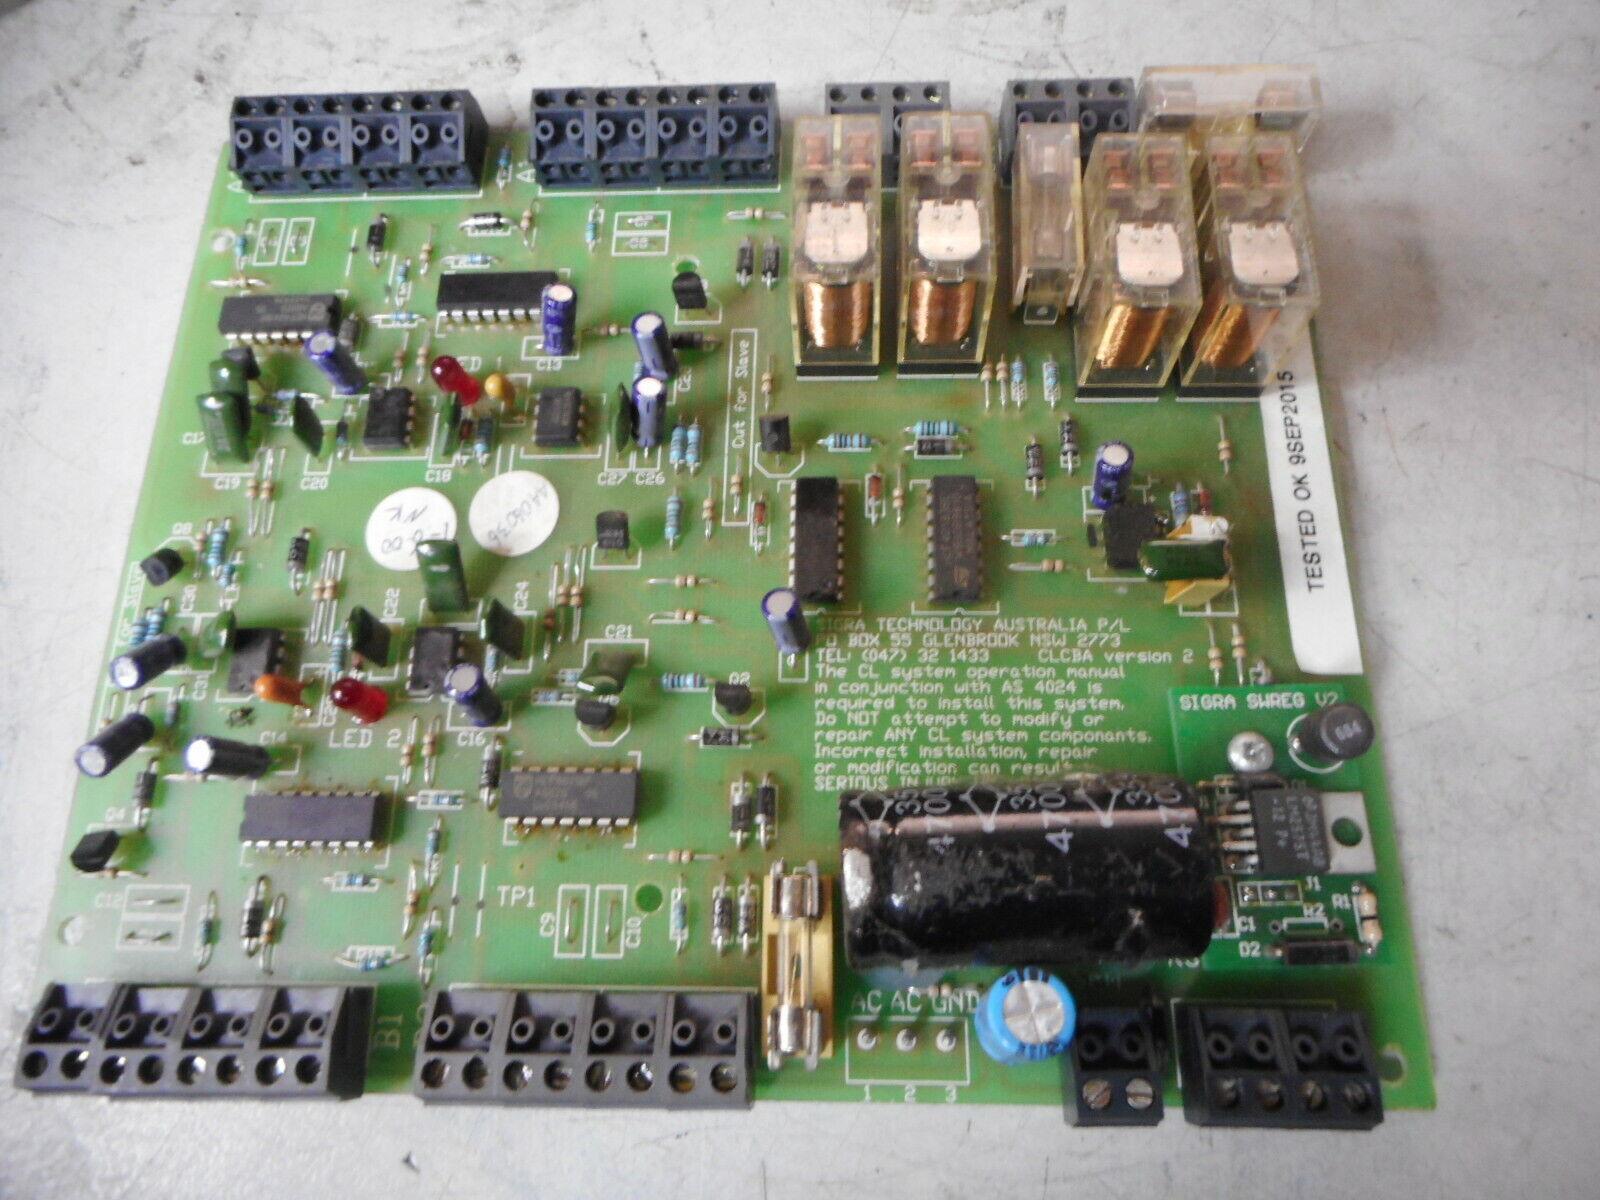 SIGRA OPTRONIC CLA LIGHT CURTAIN CONTROL BOARD -- CBA 77 240